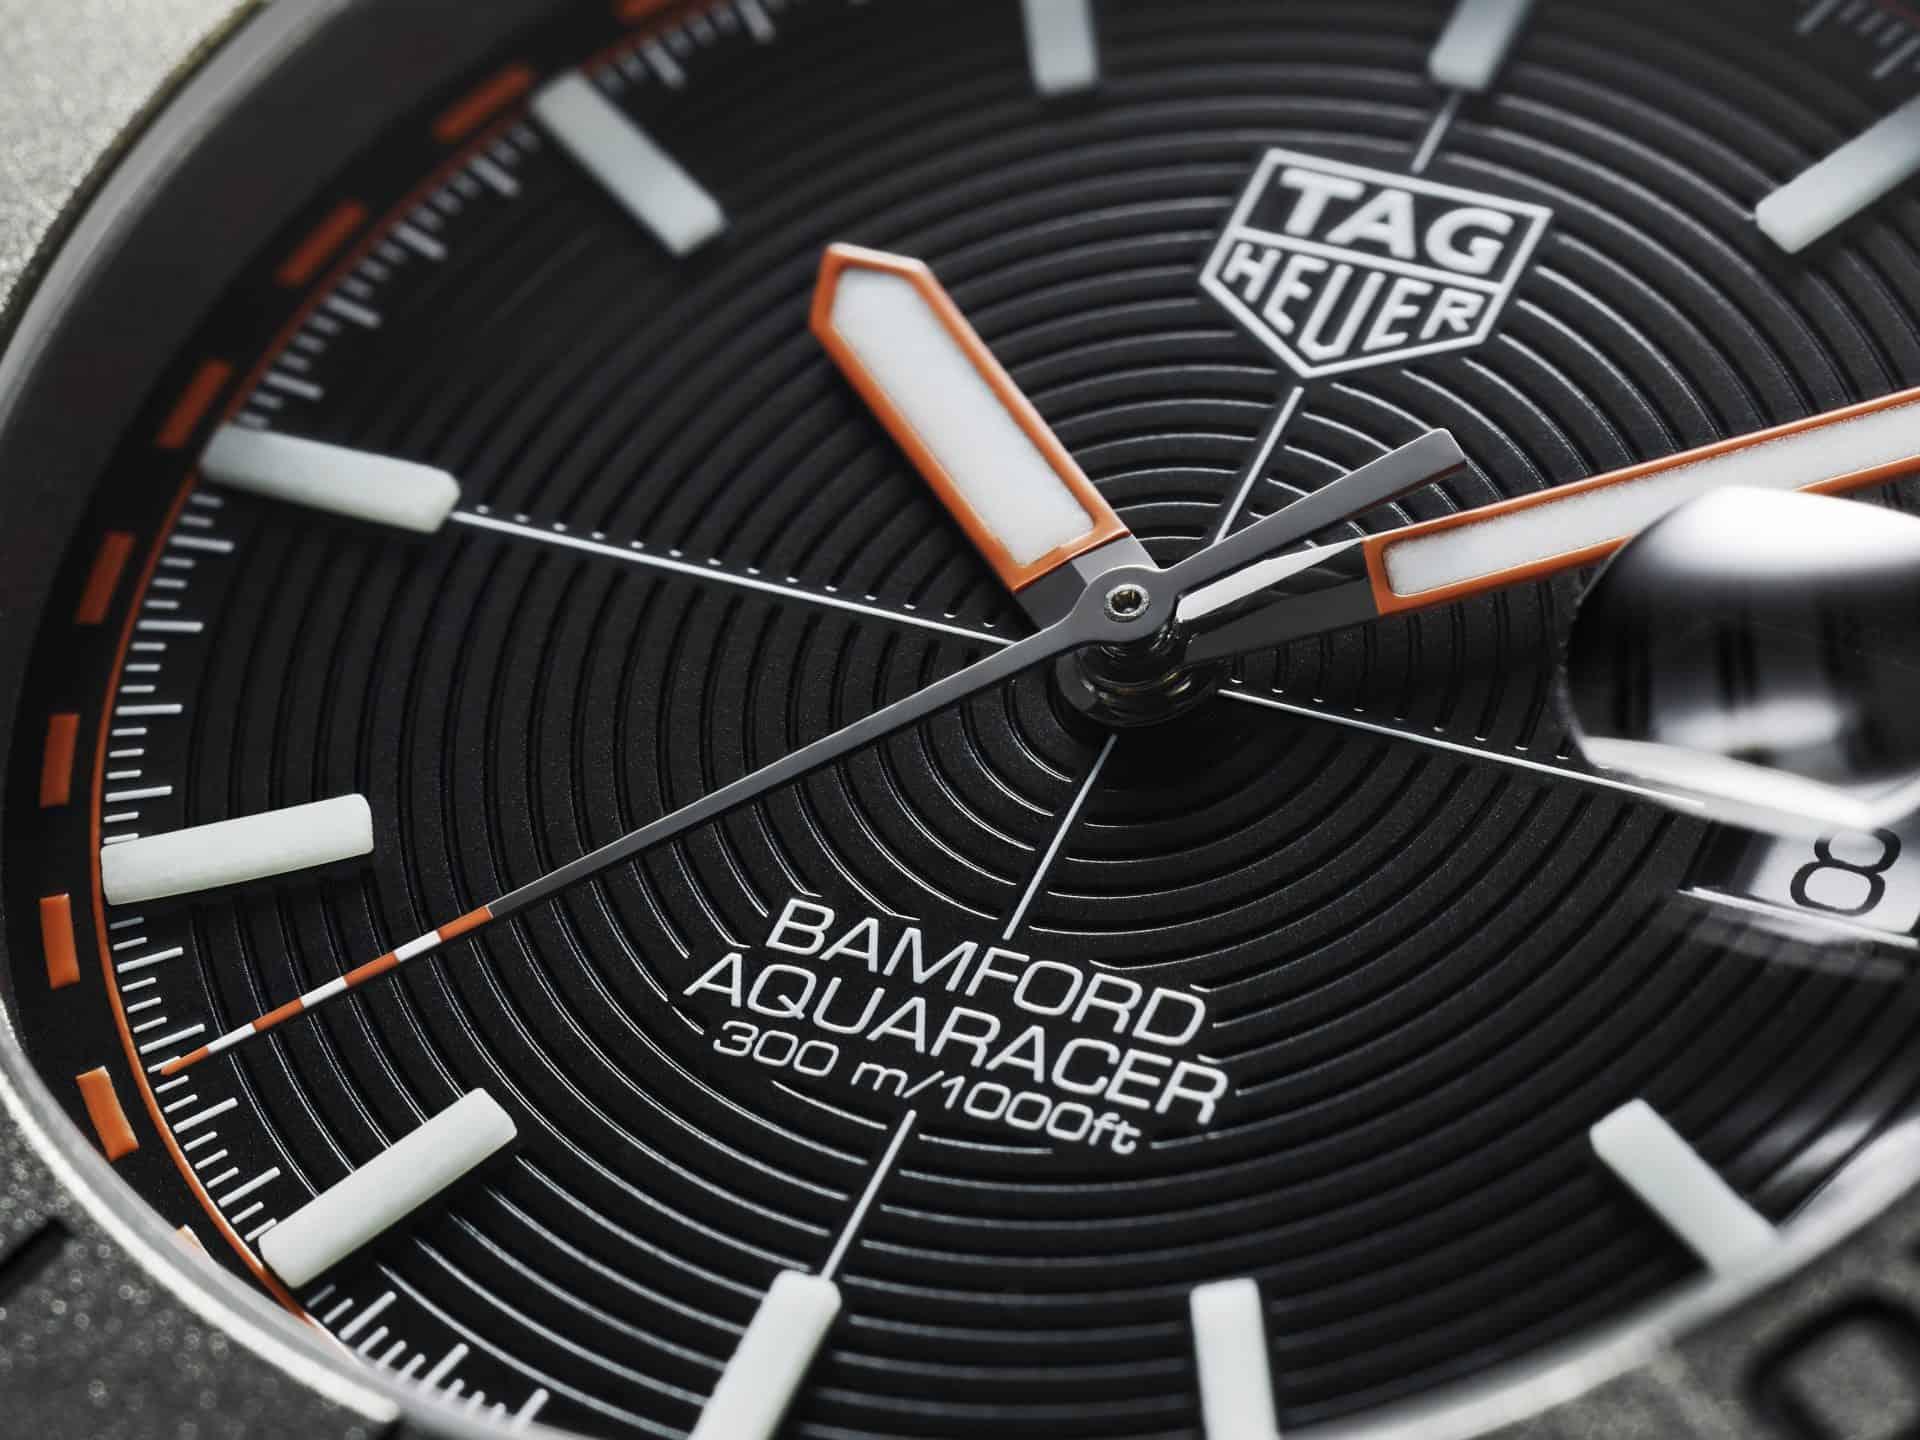 Zifferblatt TAG Heuer Aquaracer Bamford Limited Edition